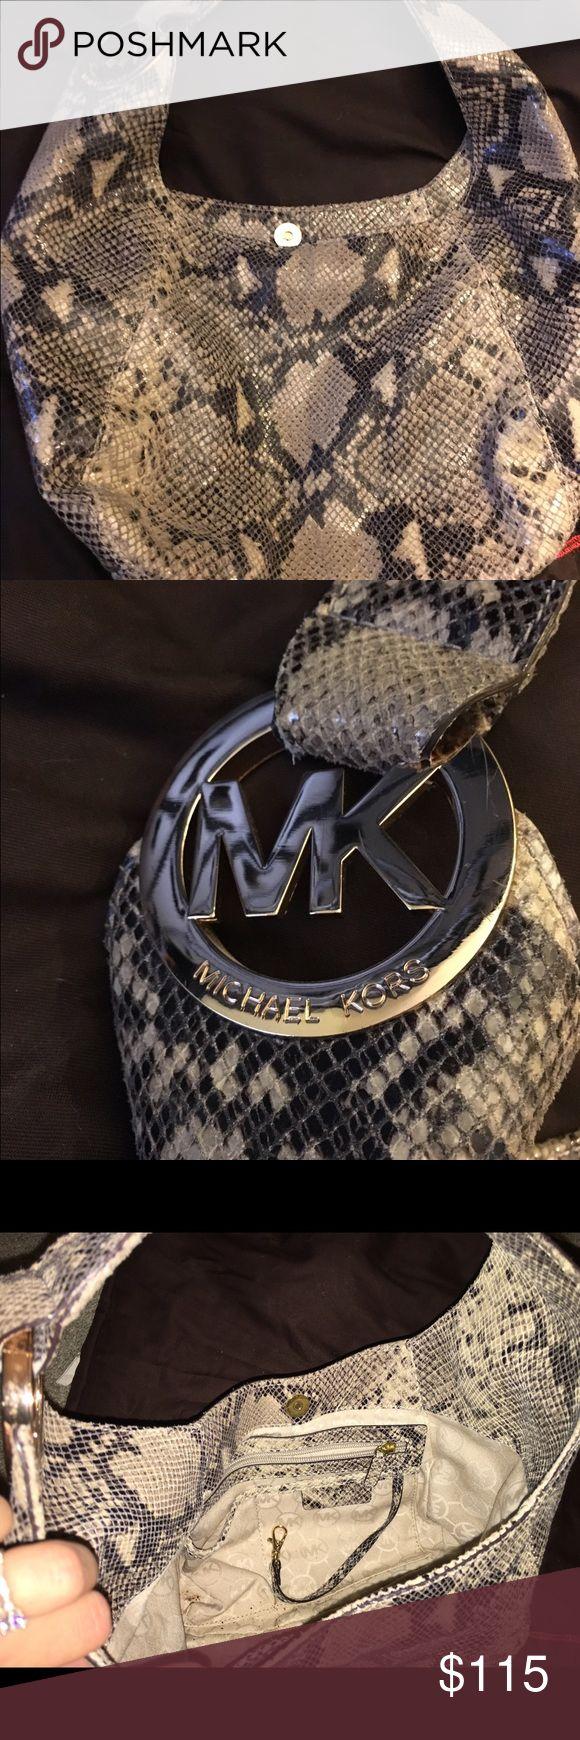 Michael Kors Fulton embossed Python hobo MICHAEL Michael Kors Fulton Embossed Python hobo bag. Never used. 13 X 19.25 x 7. MICHAEL Michael Kors Bags Hobos